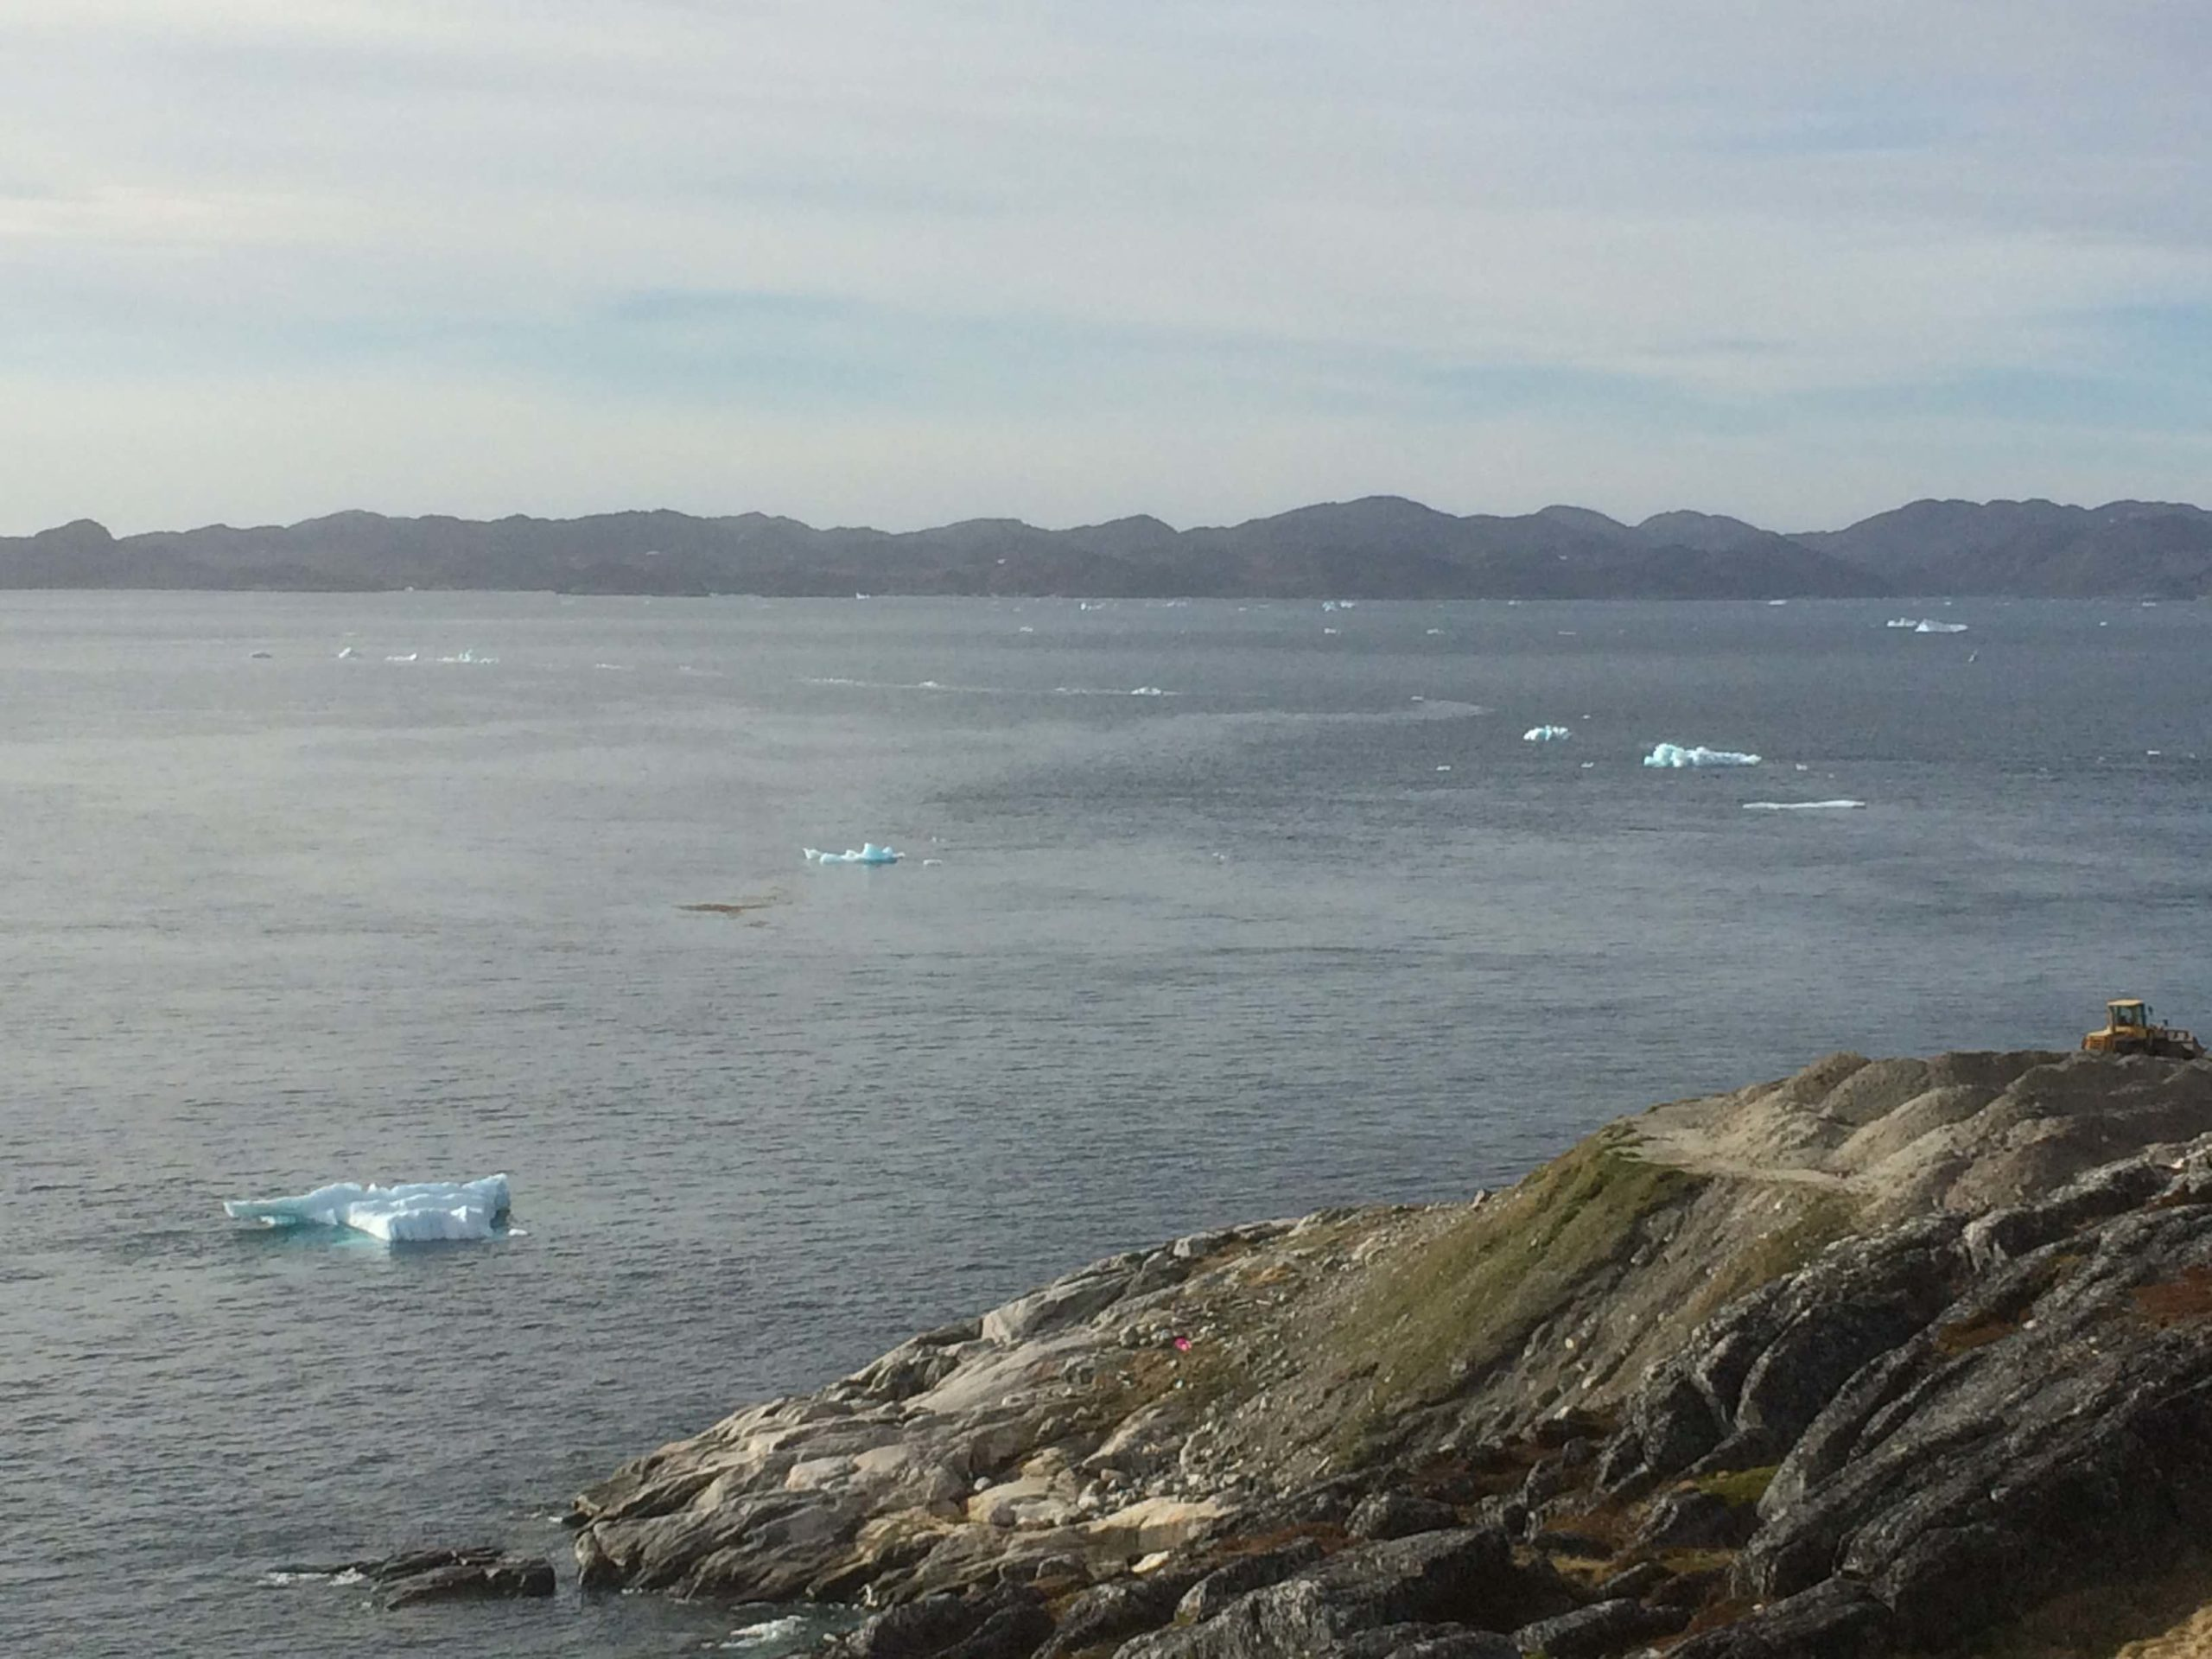 icebergs off Nuuk, Greenland